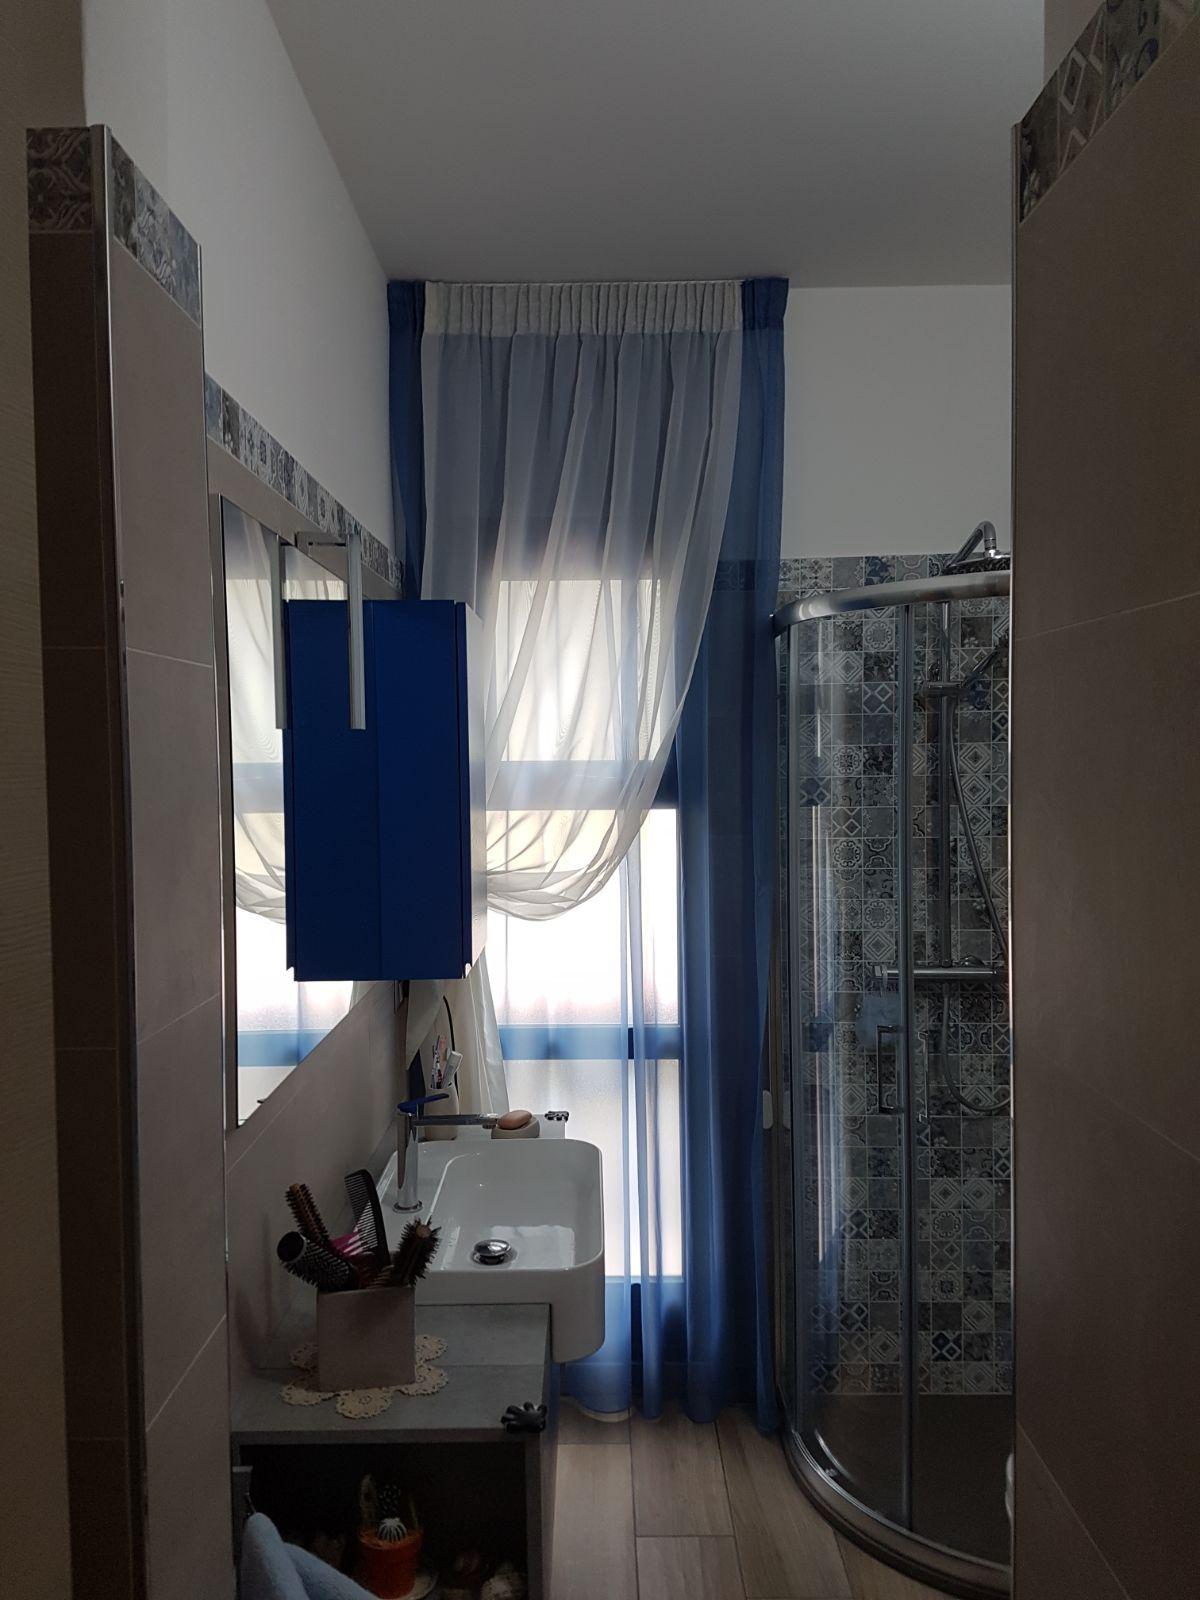 Tenda arricciata doppia per bagno tende da interni serramenti ed avvolgibili pinterest - Tenda per finestra bagno ...